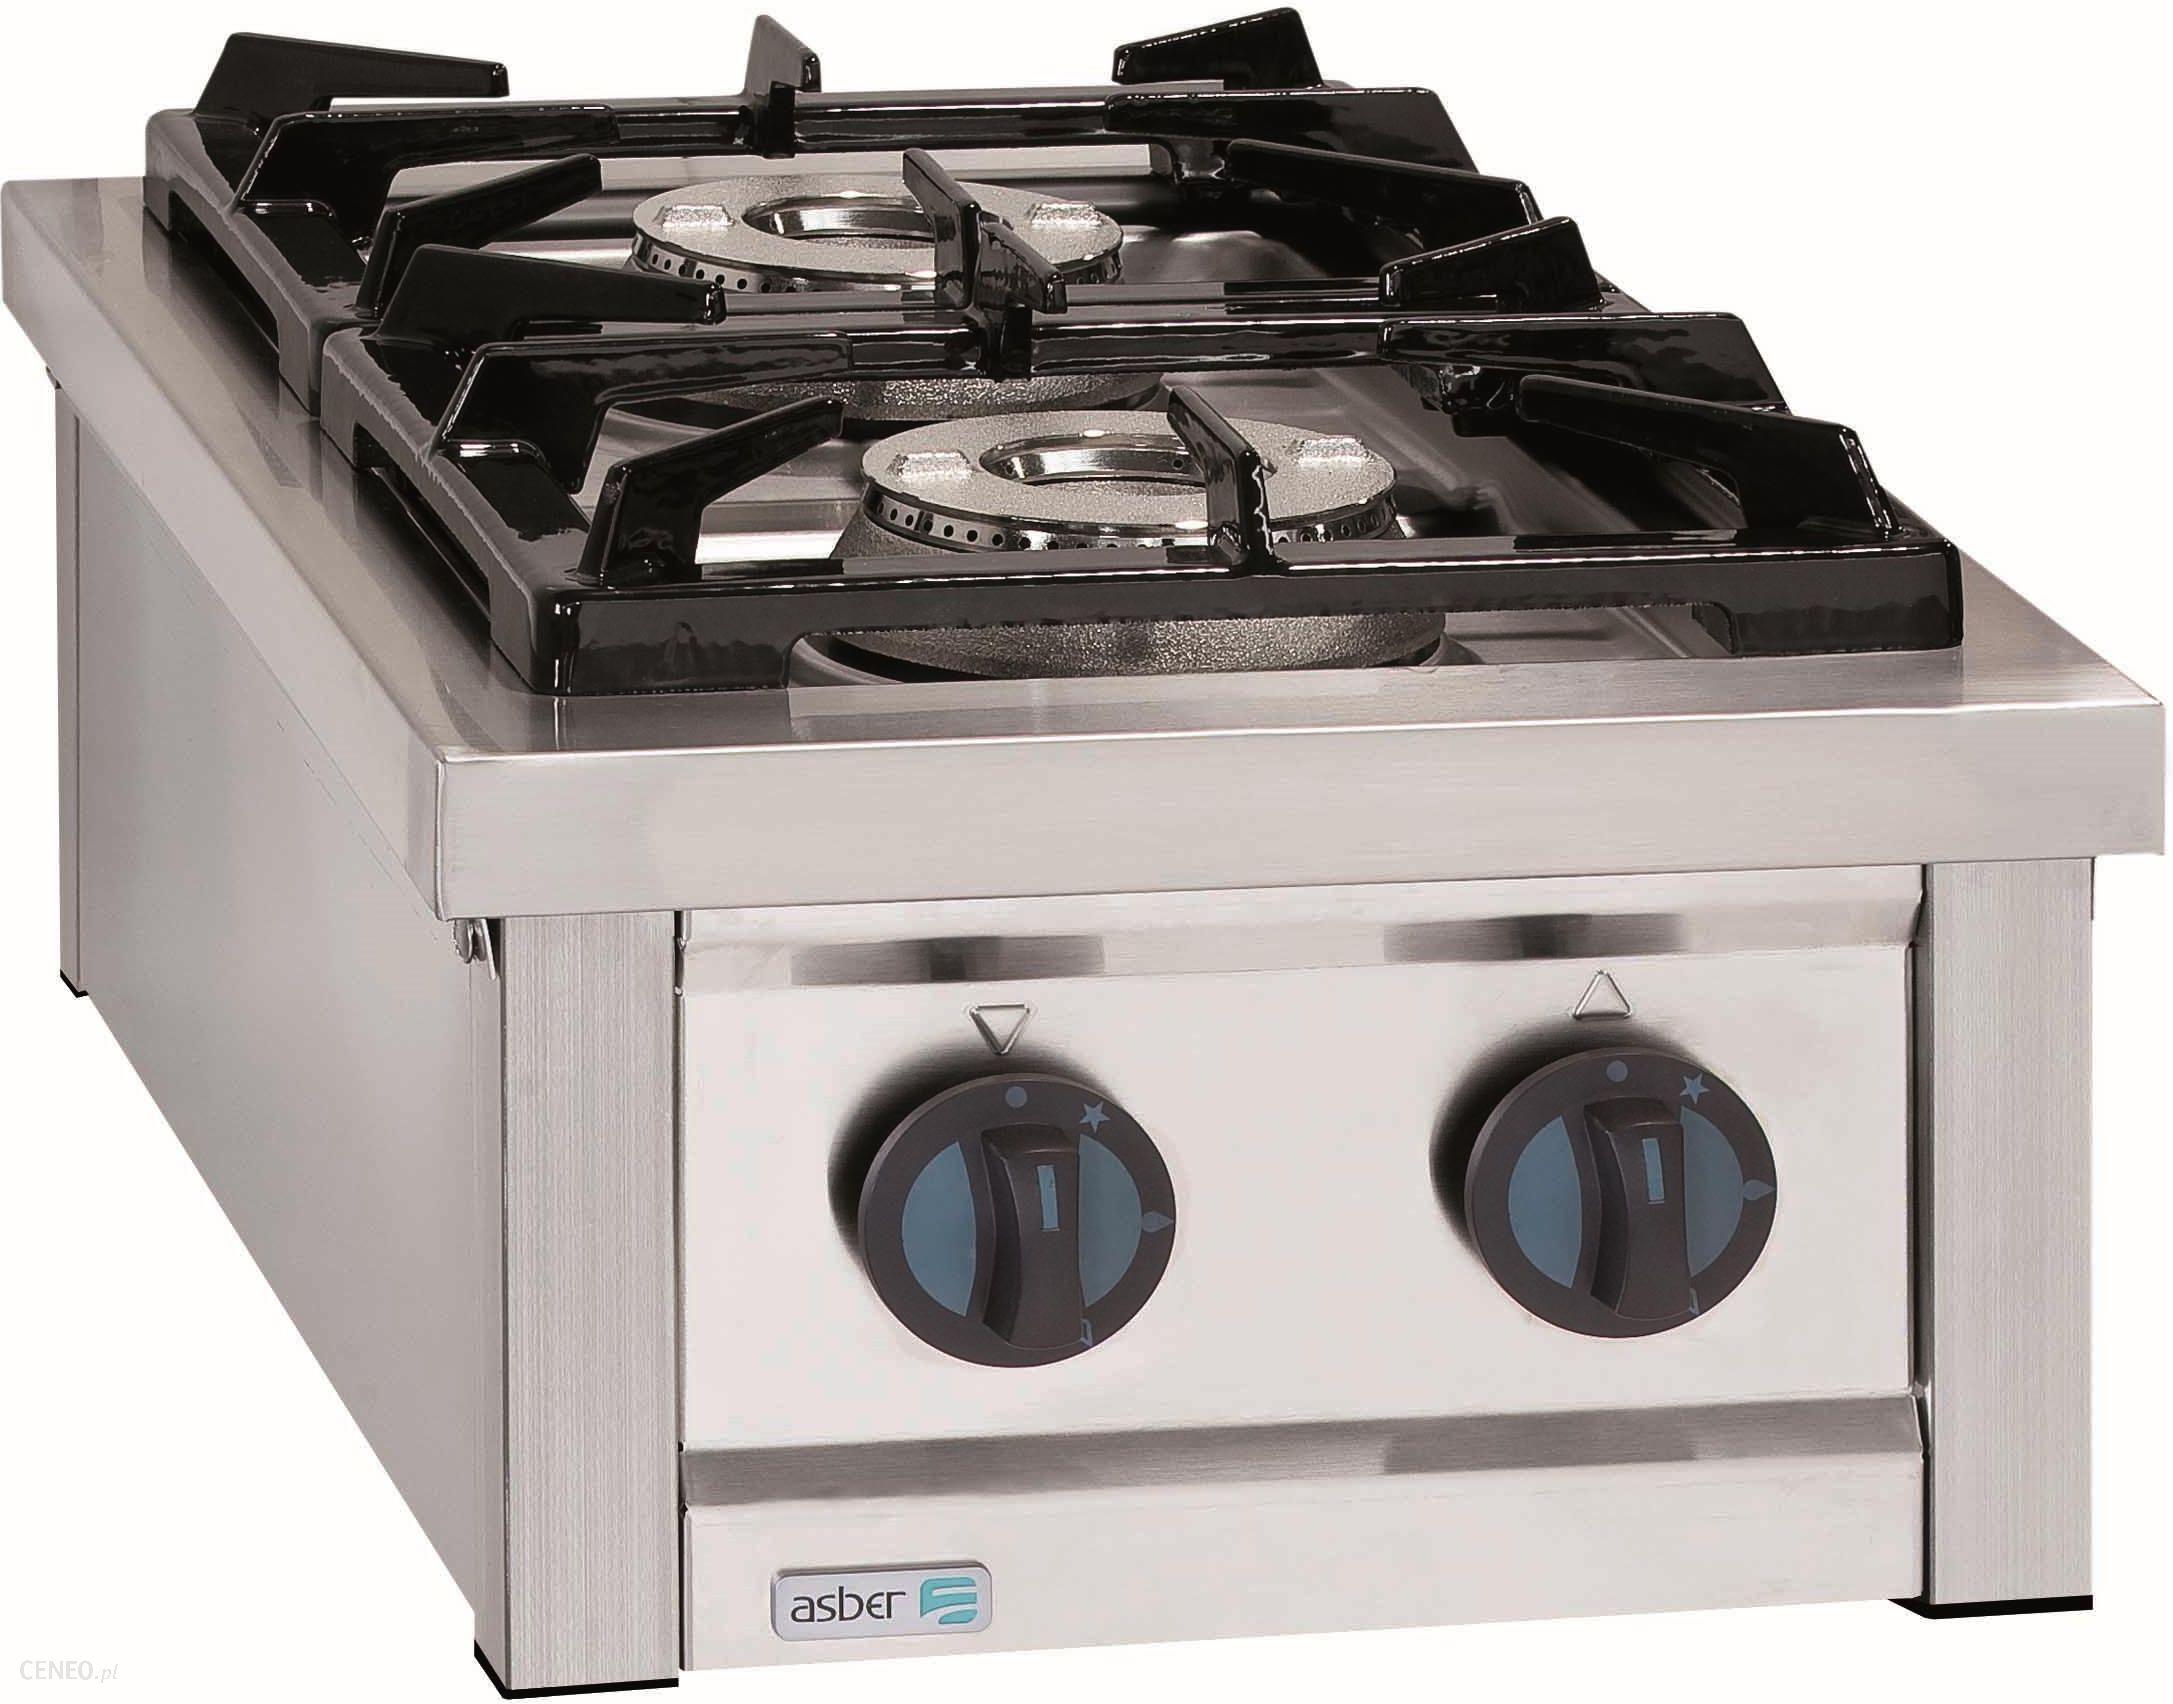 Kuchnia Gazowa 2 Palnikowa Nastawna Propan Butan 125 Kw 400x700x310 Mm Asber Eco Cook